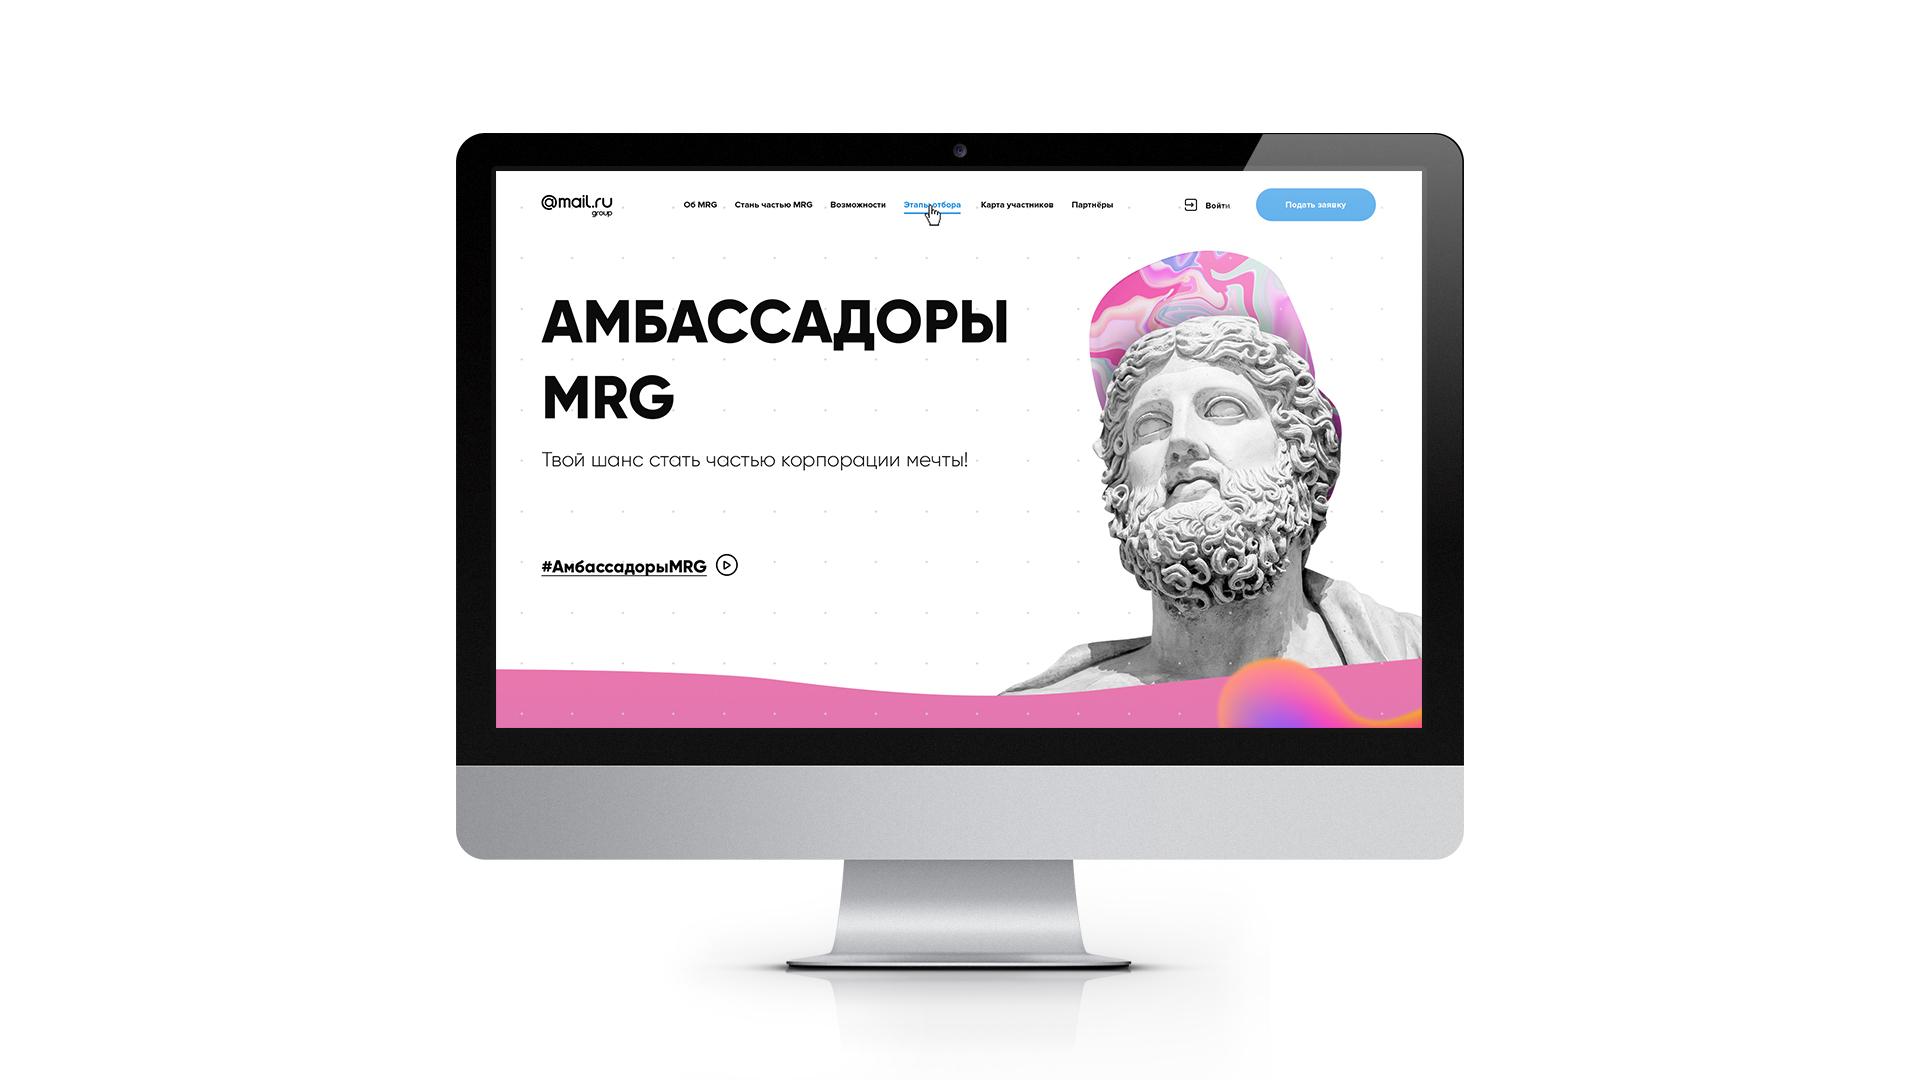 Ambassador_1